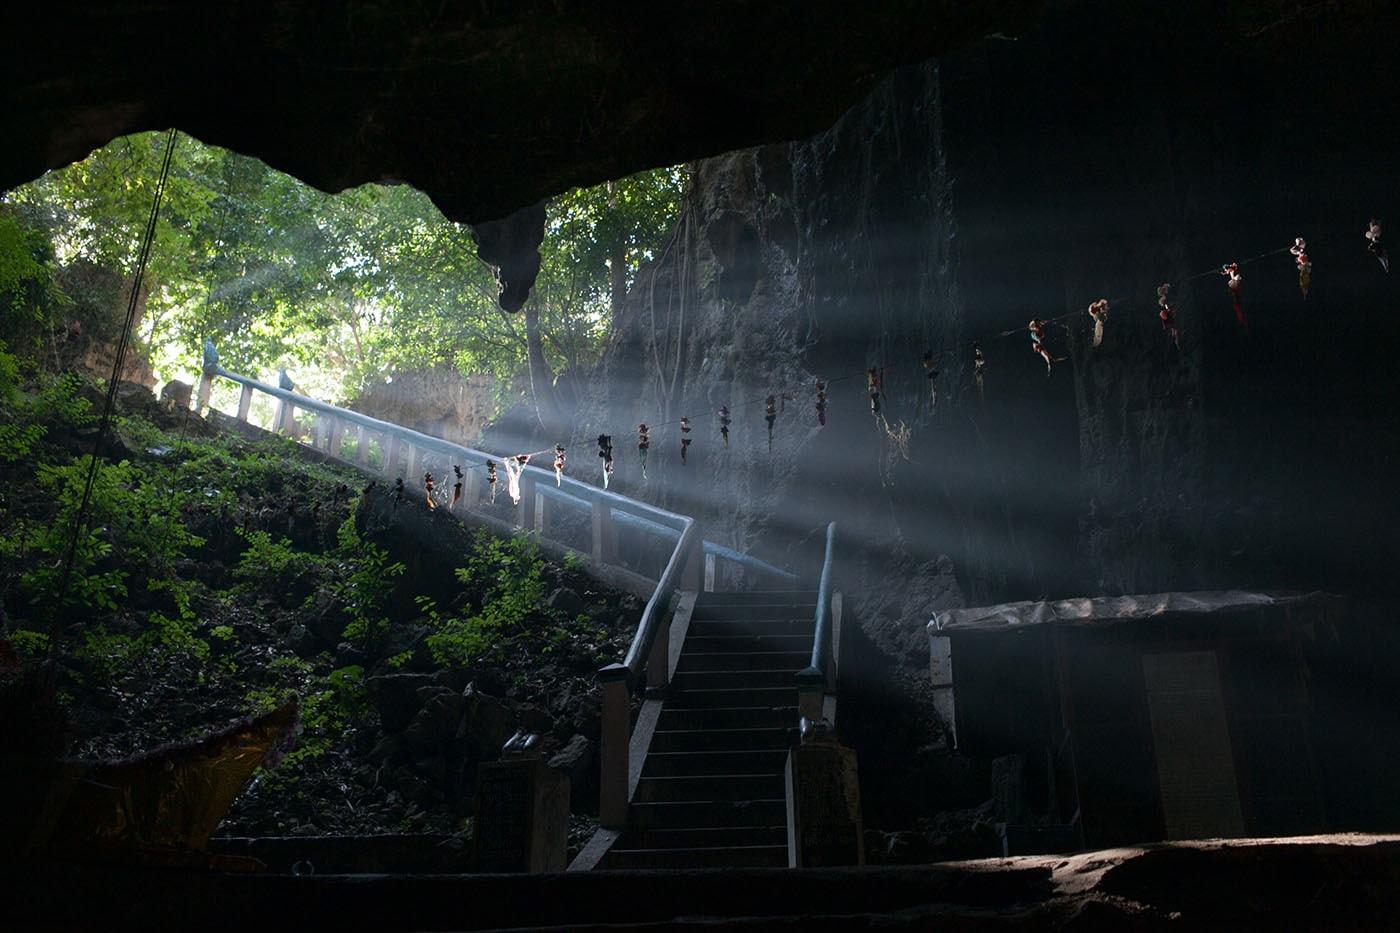 Killing cave in Battambang, Cambodia